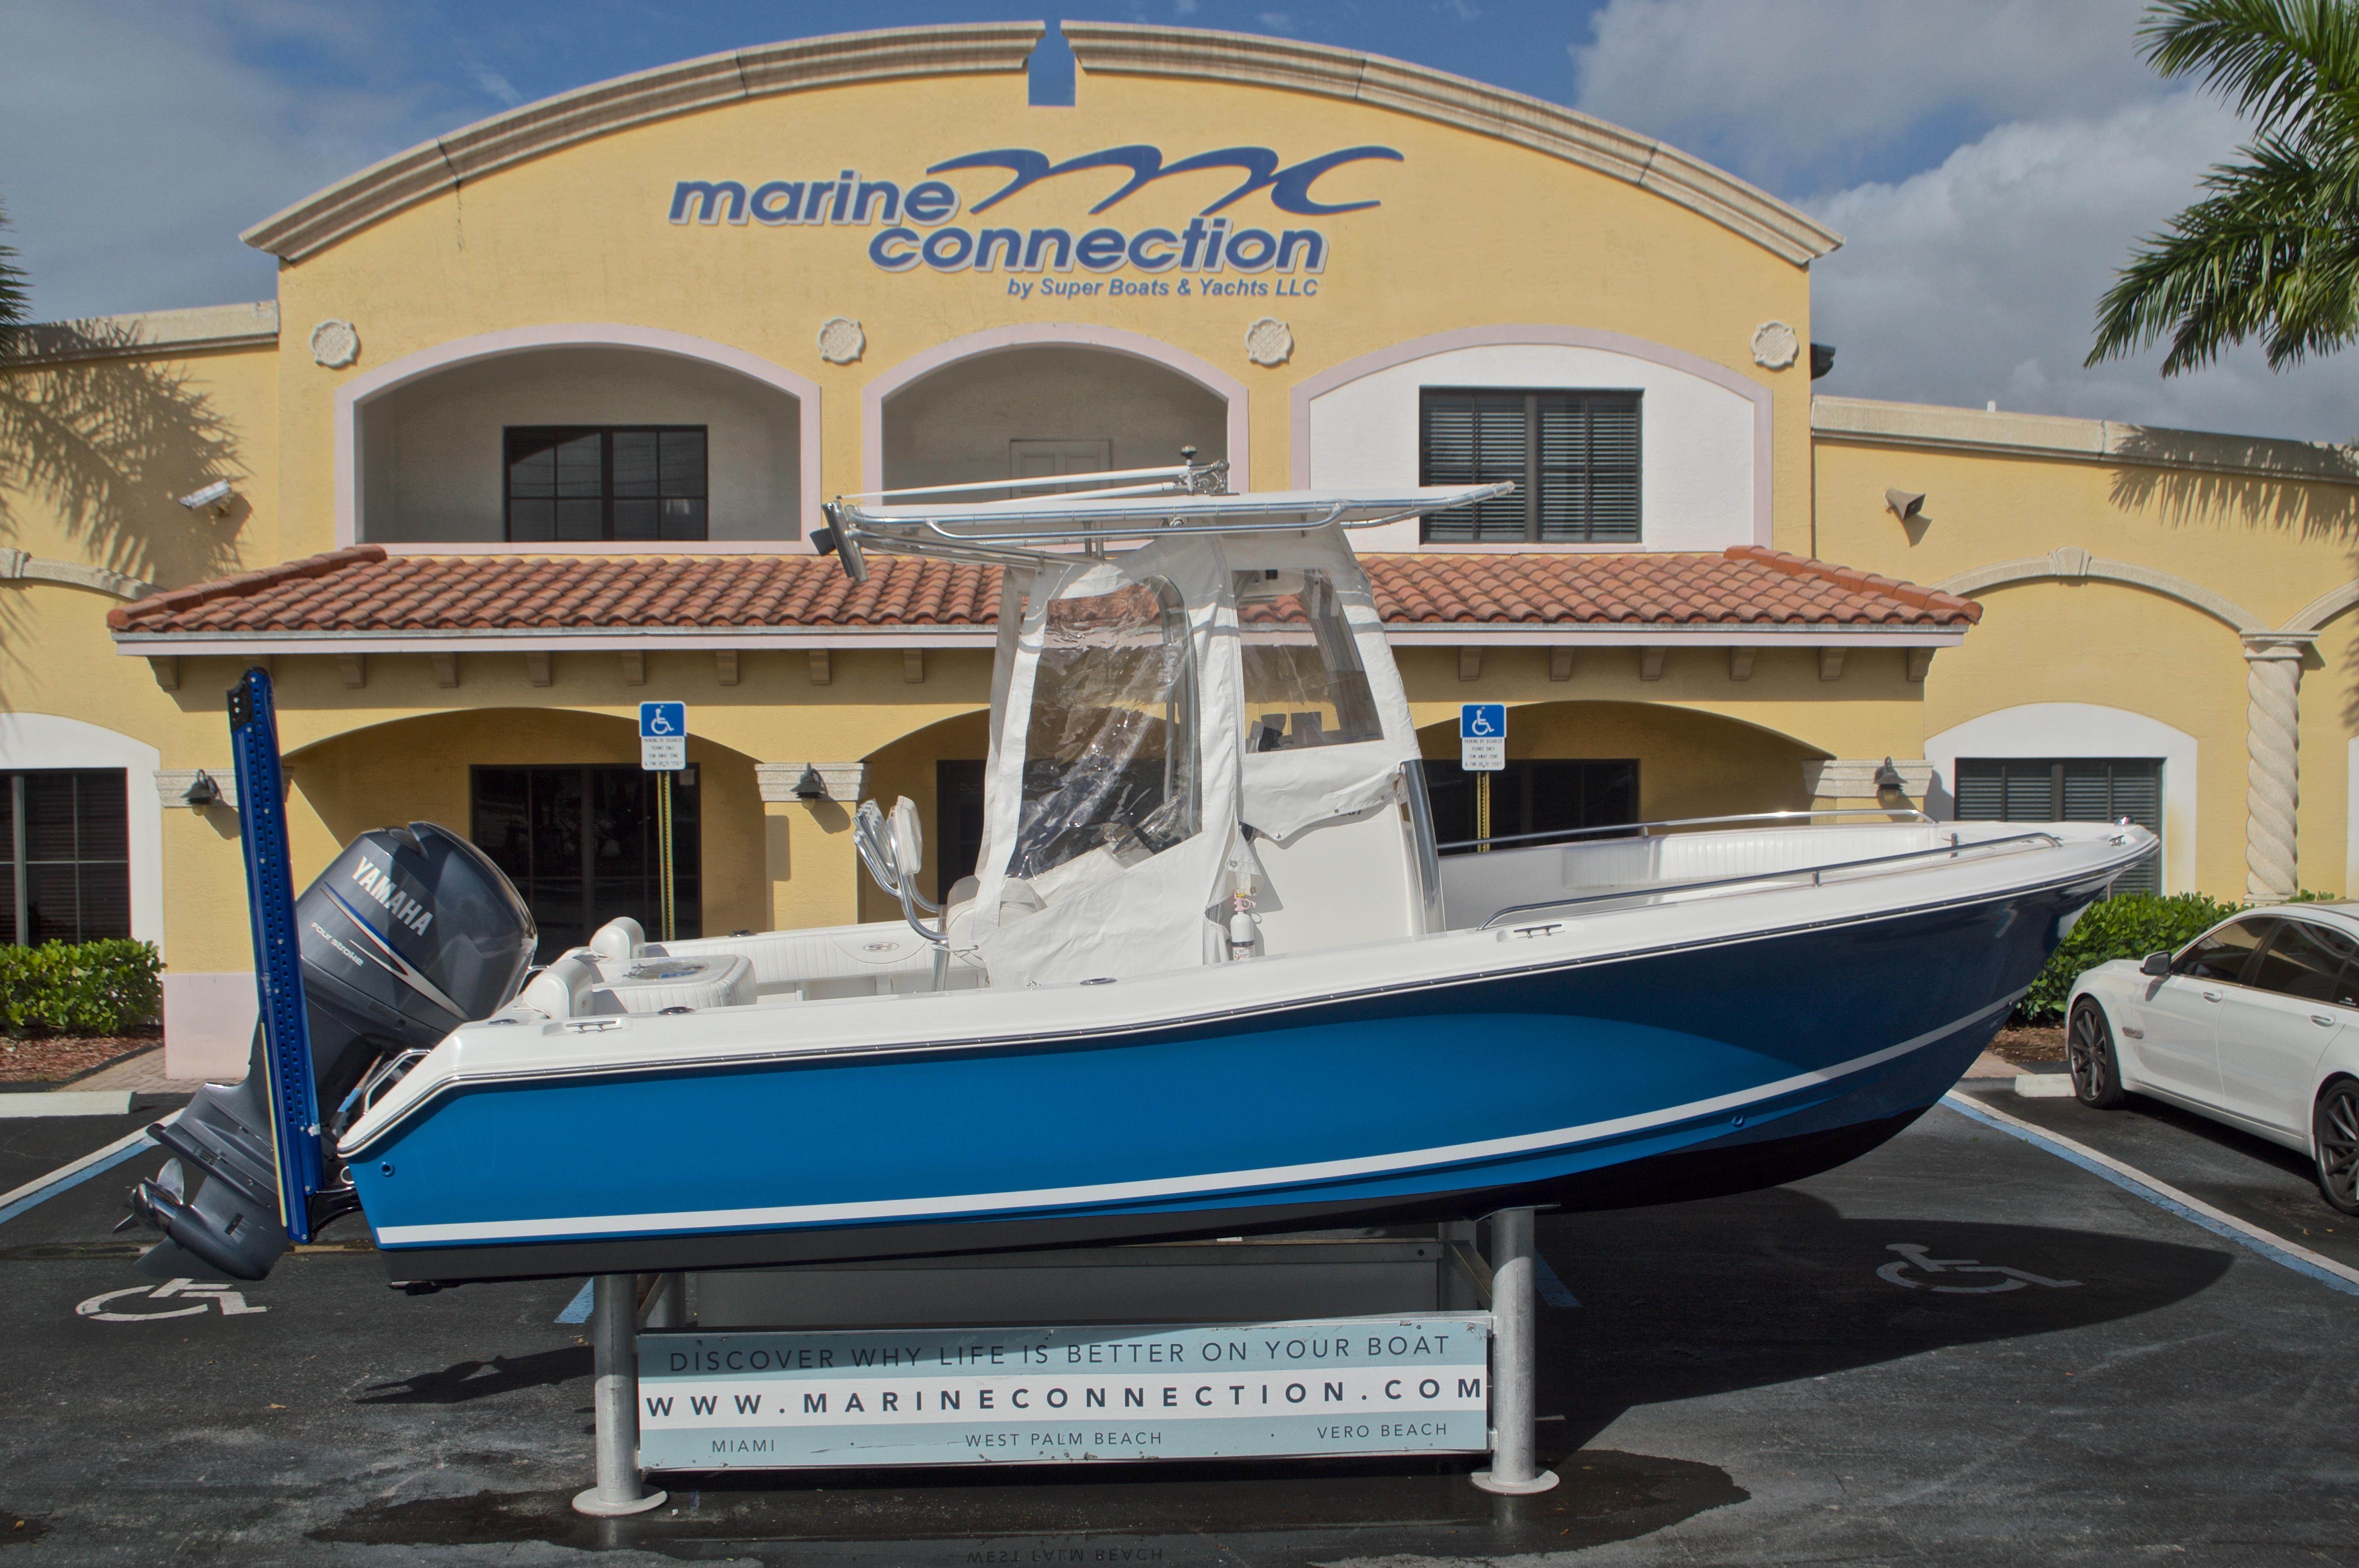 Used 2009 Sea Hunt 207 Triton boat for sale in West Palm Beach, FL